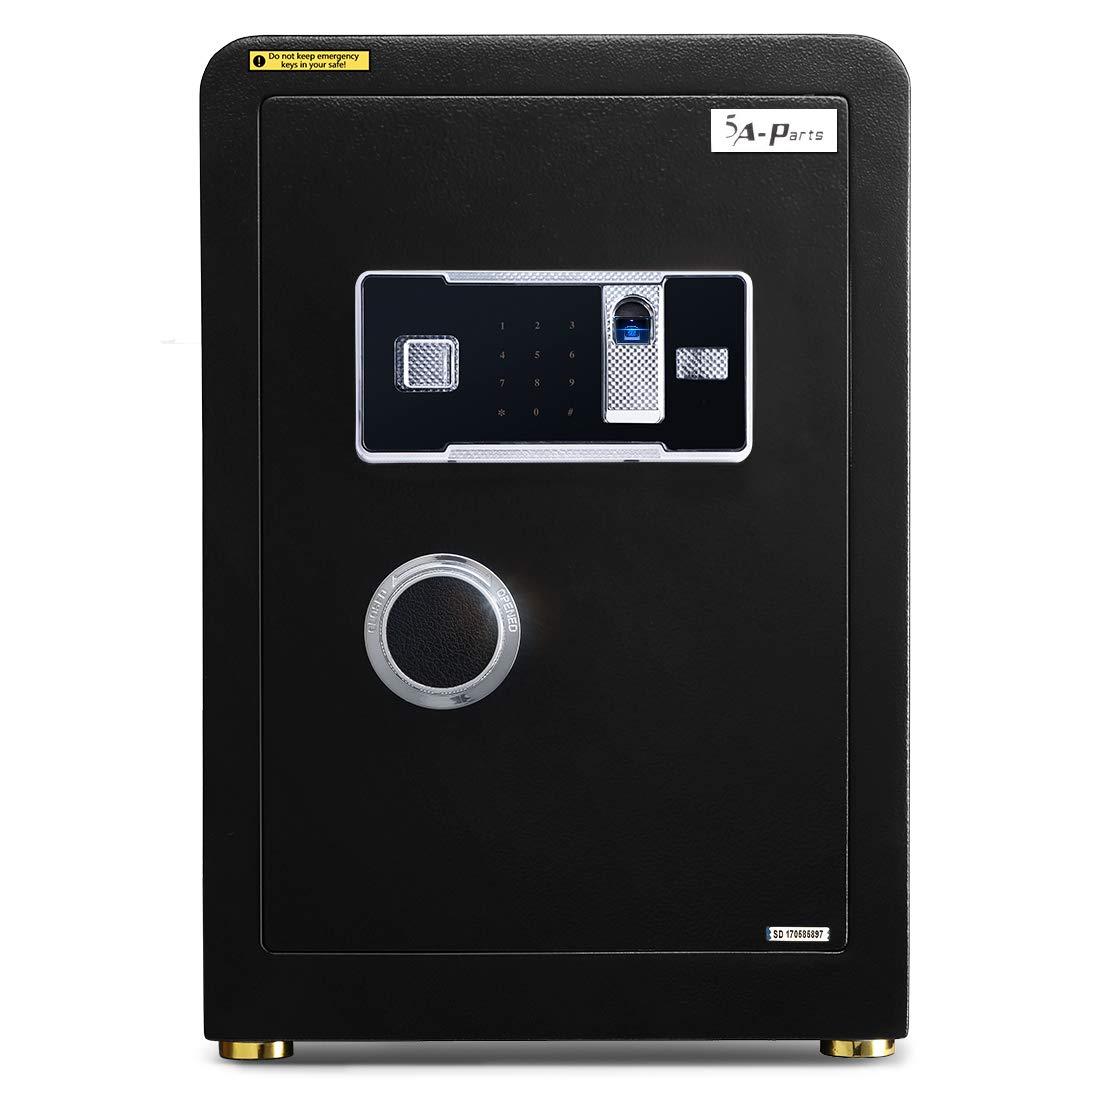 Ainfox Digital Security Safe Box, 2 Cubic FeetCabinets Fingerprint Biometric Wall Safe Lock Box Cash Strongbox with Number Keys Emergency Lock